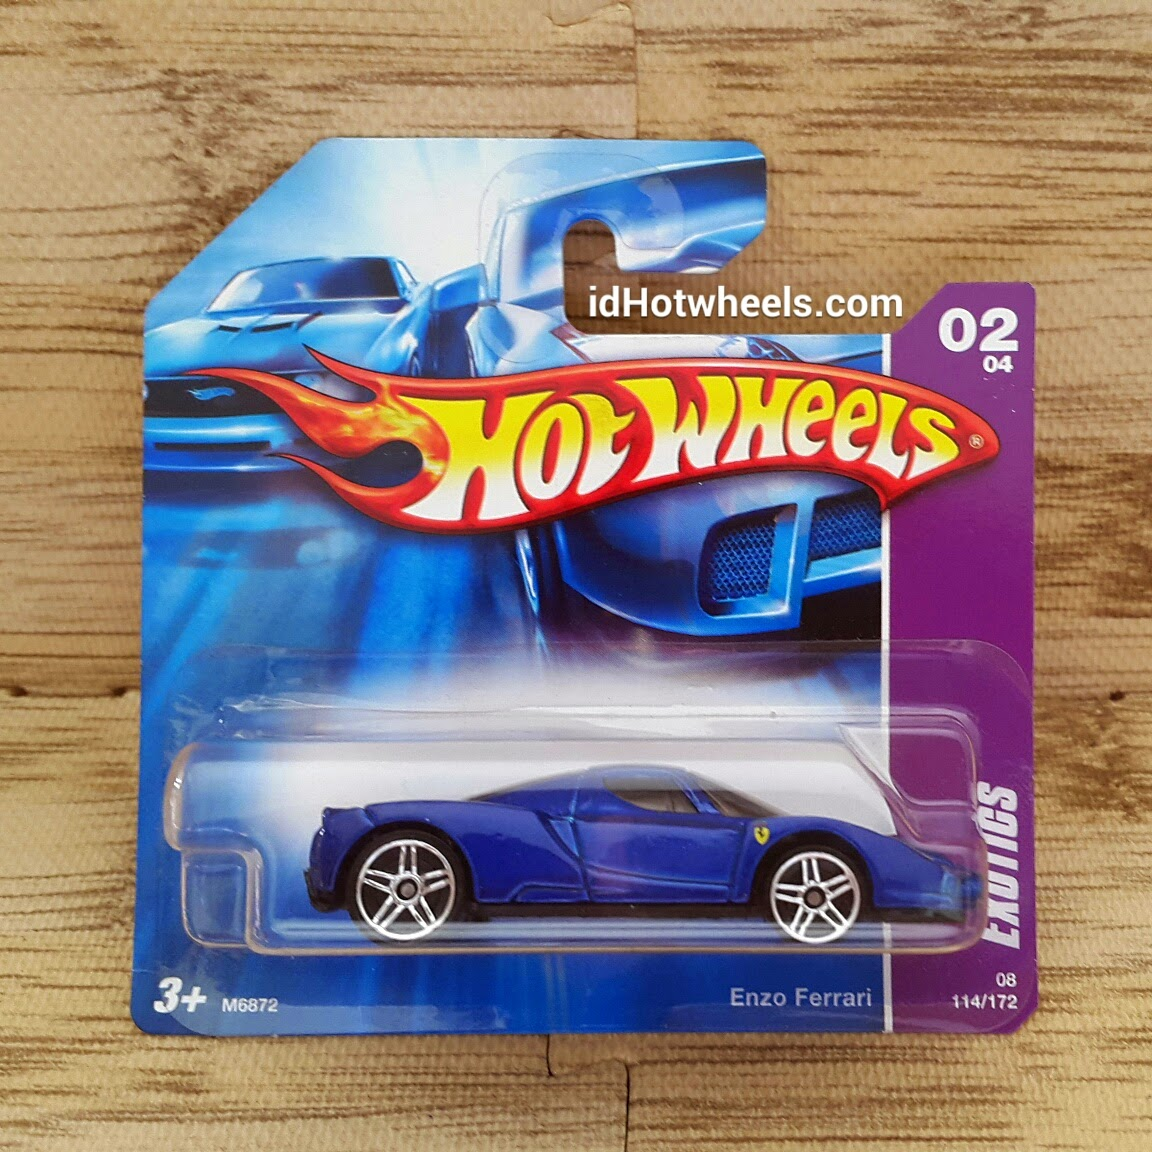 Hot Wheels Ferrari Skala 164 Paket 7 Pcs Dijual Indohotwheels Hotwheels Volkswagen Baja Bug White Tropicool Series 2008 Enzo Blue Exotics 114 172 Short Card